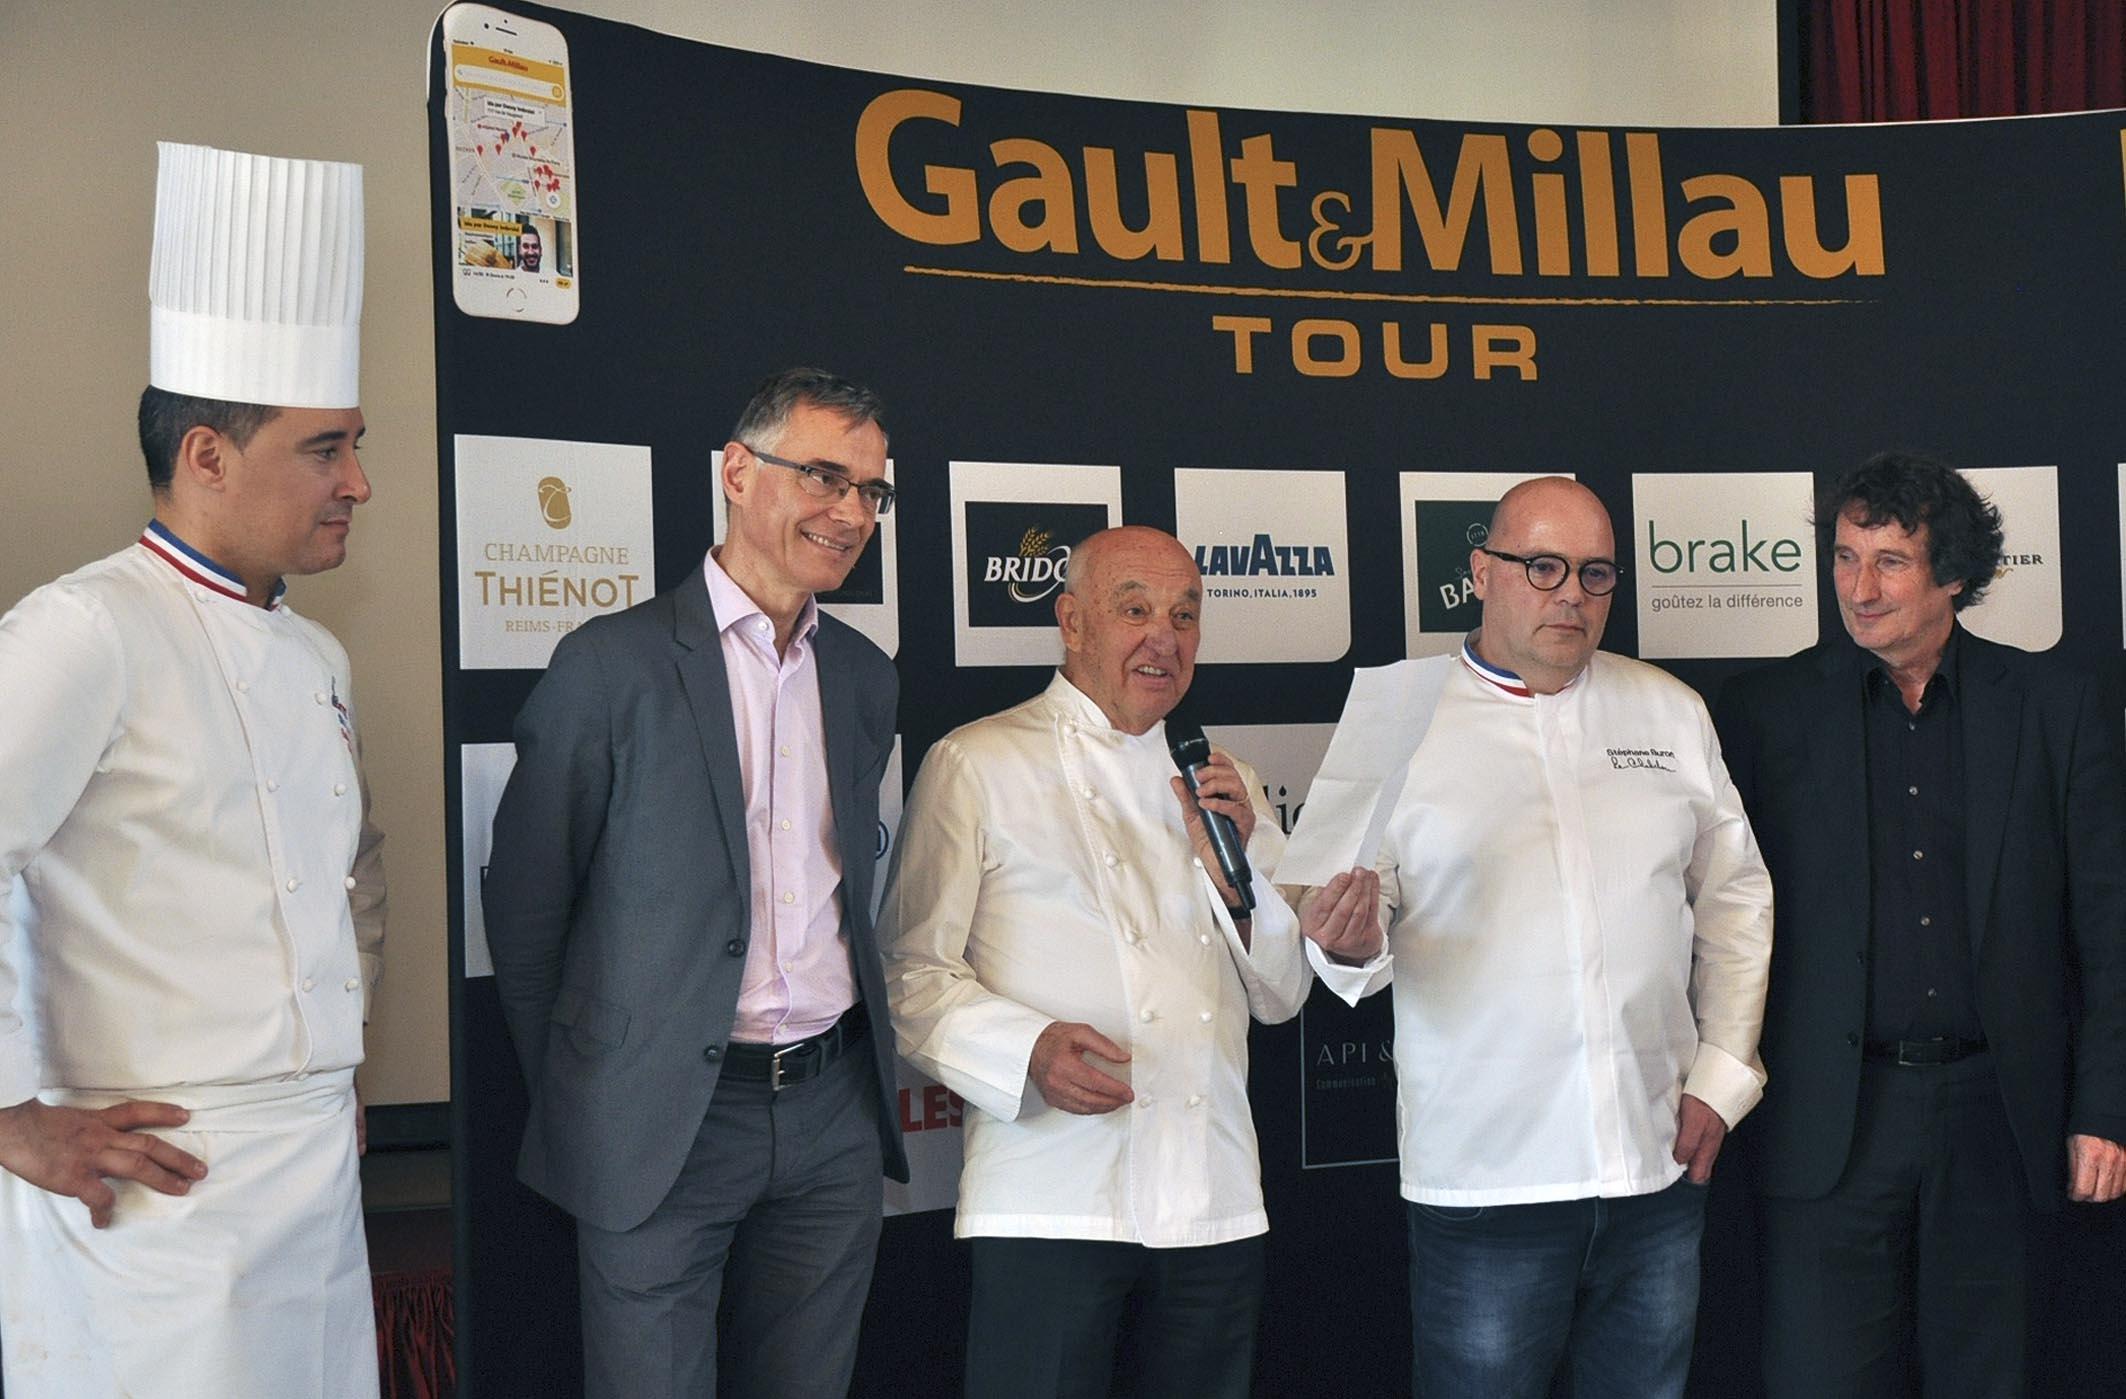 Gault&Millau Tour 2018 ©Godet_0255